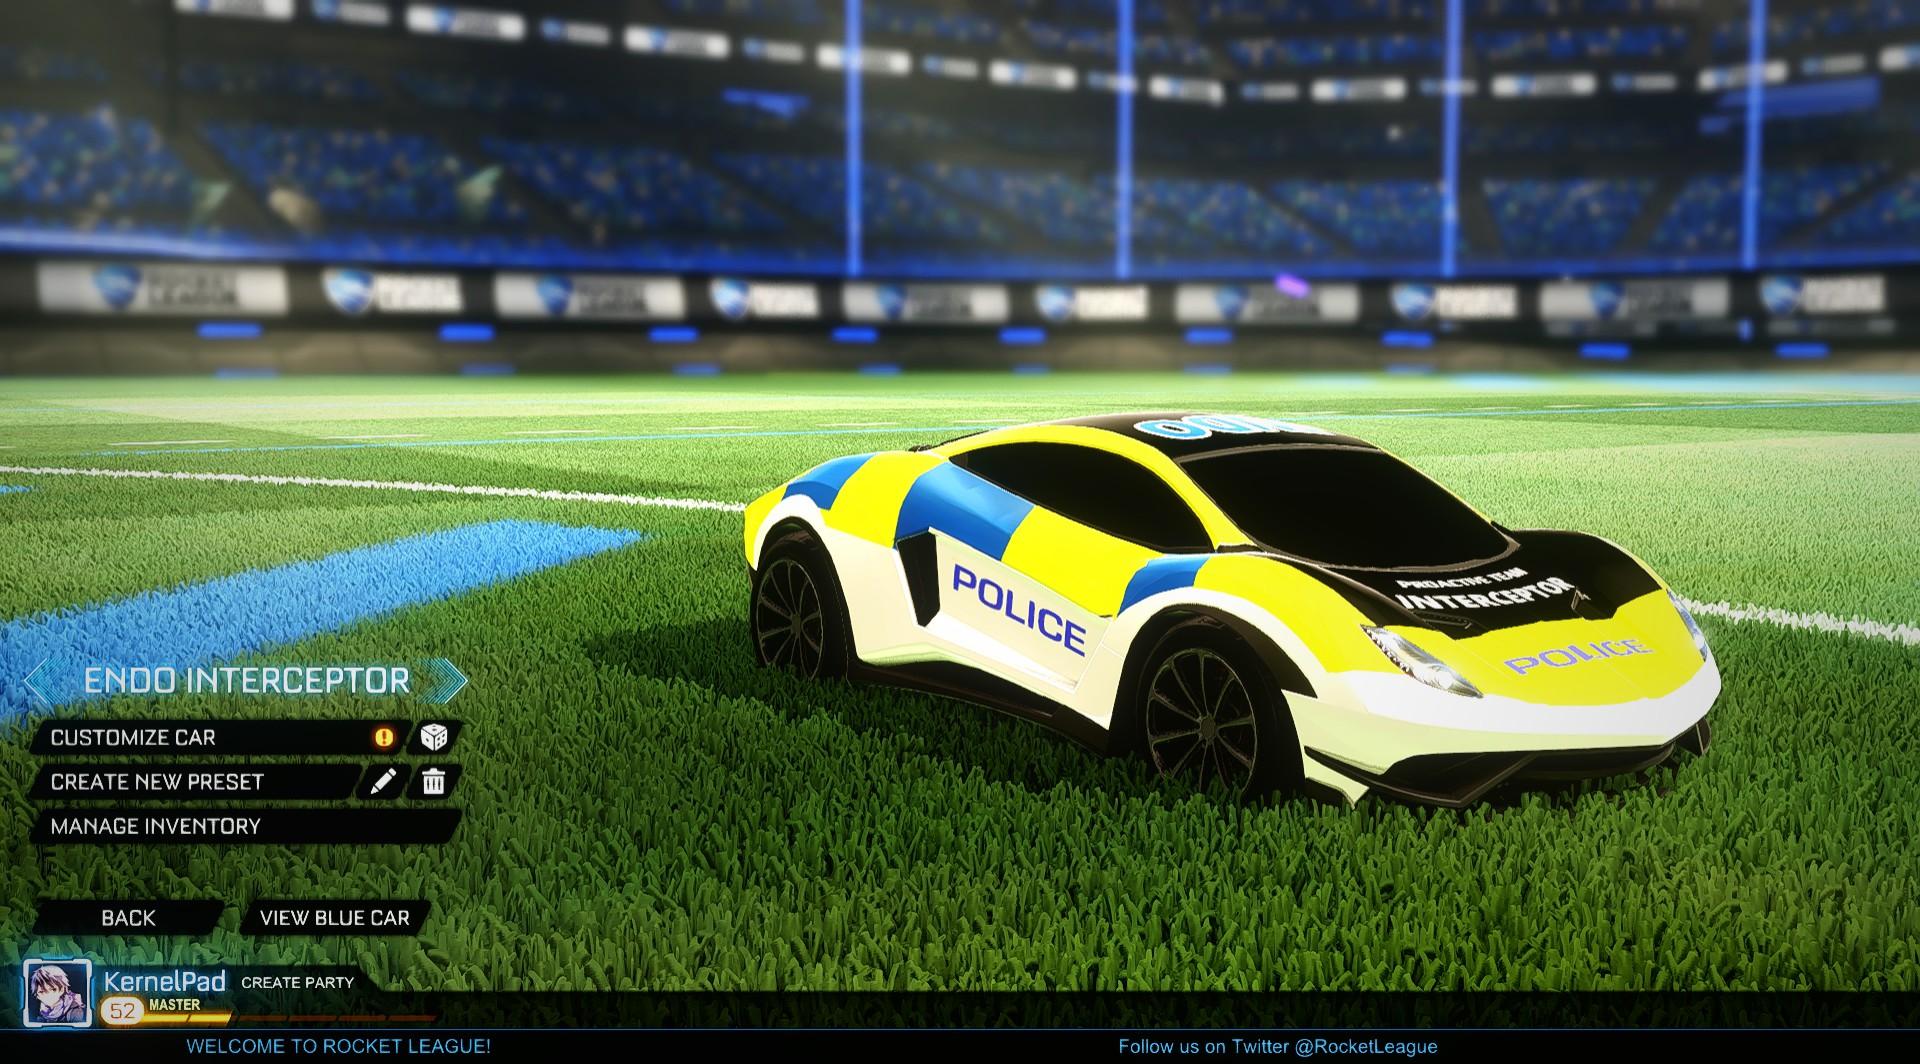 Endo | Police Interceptor